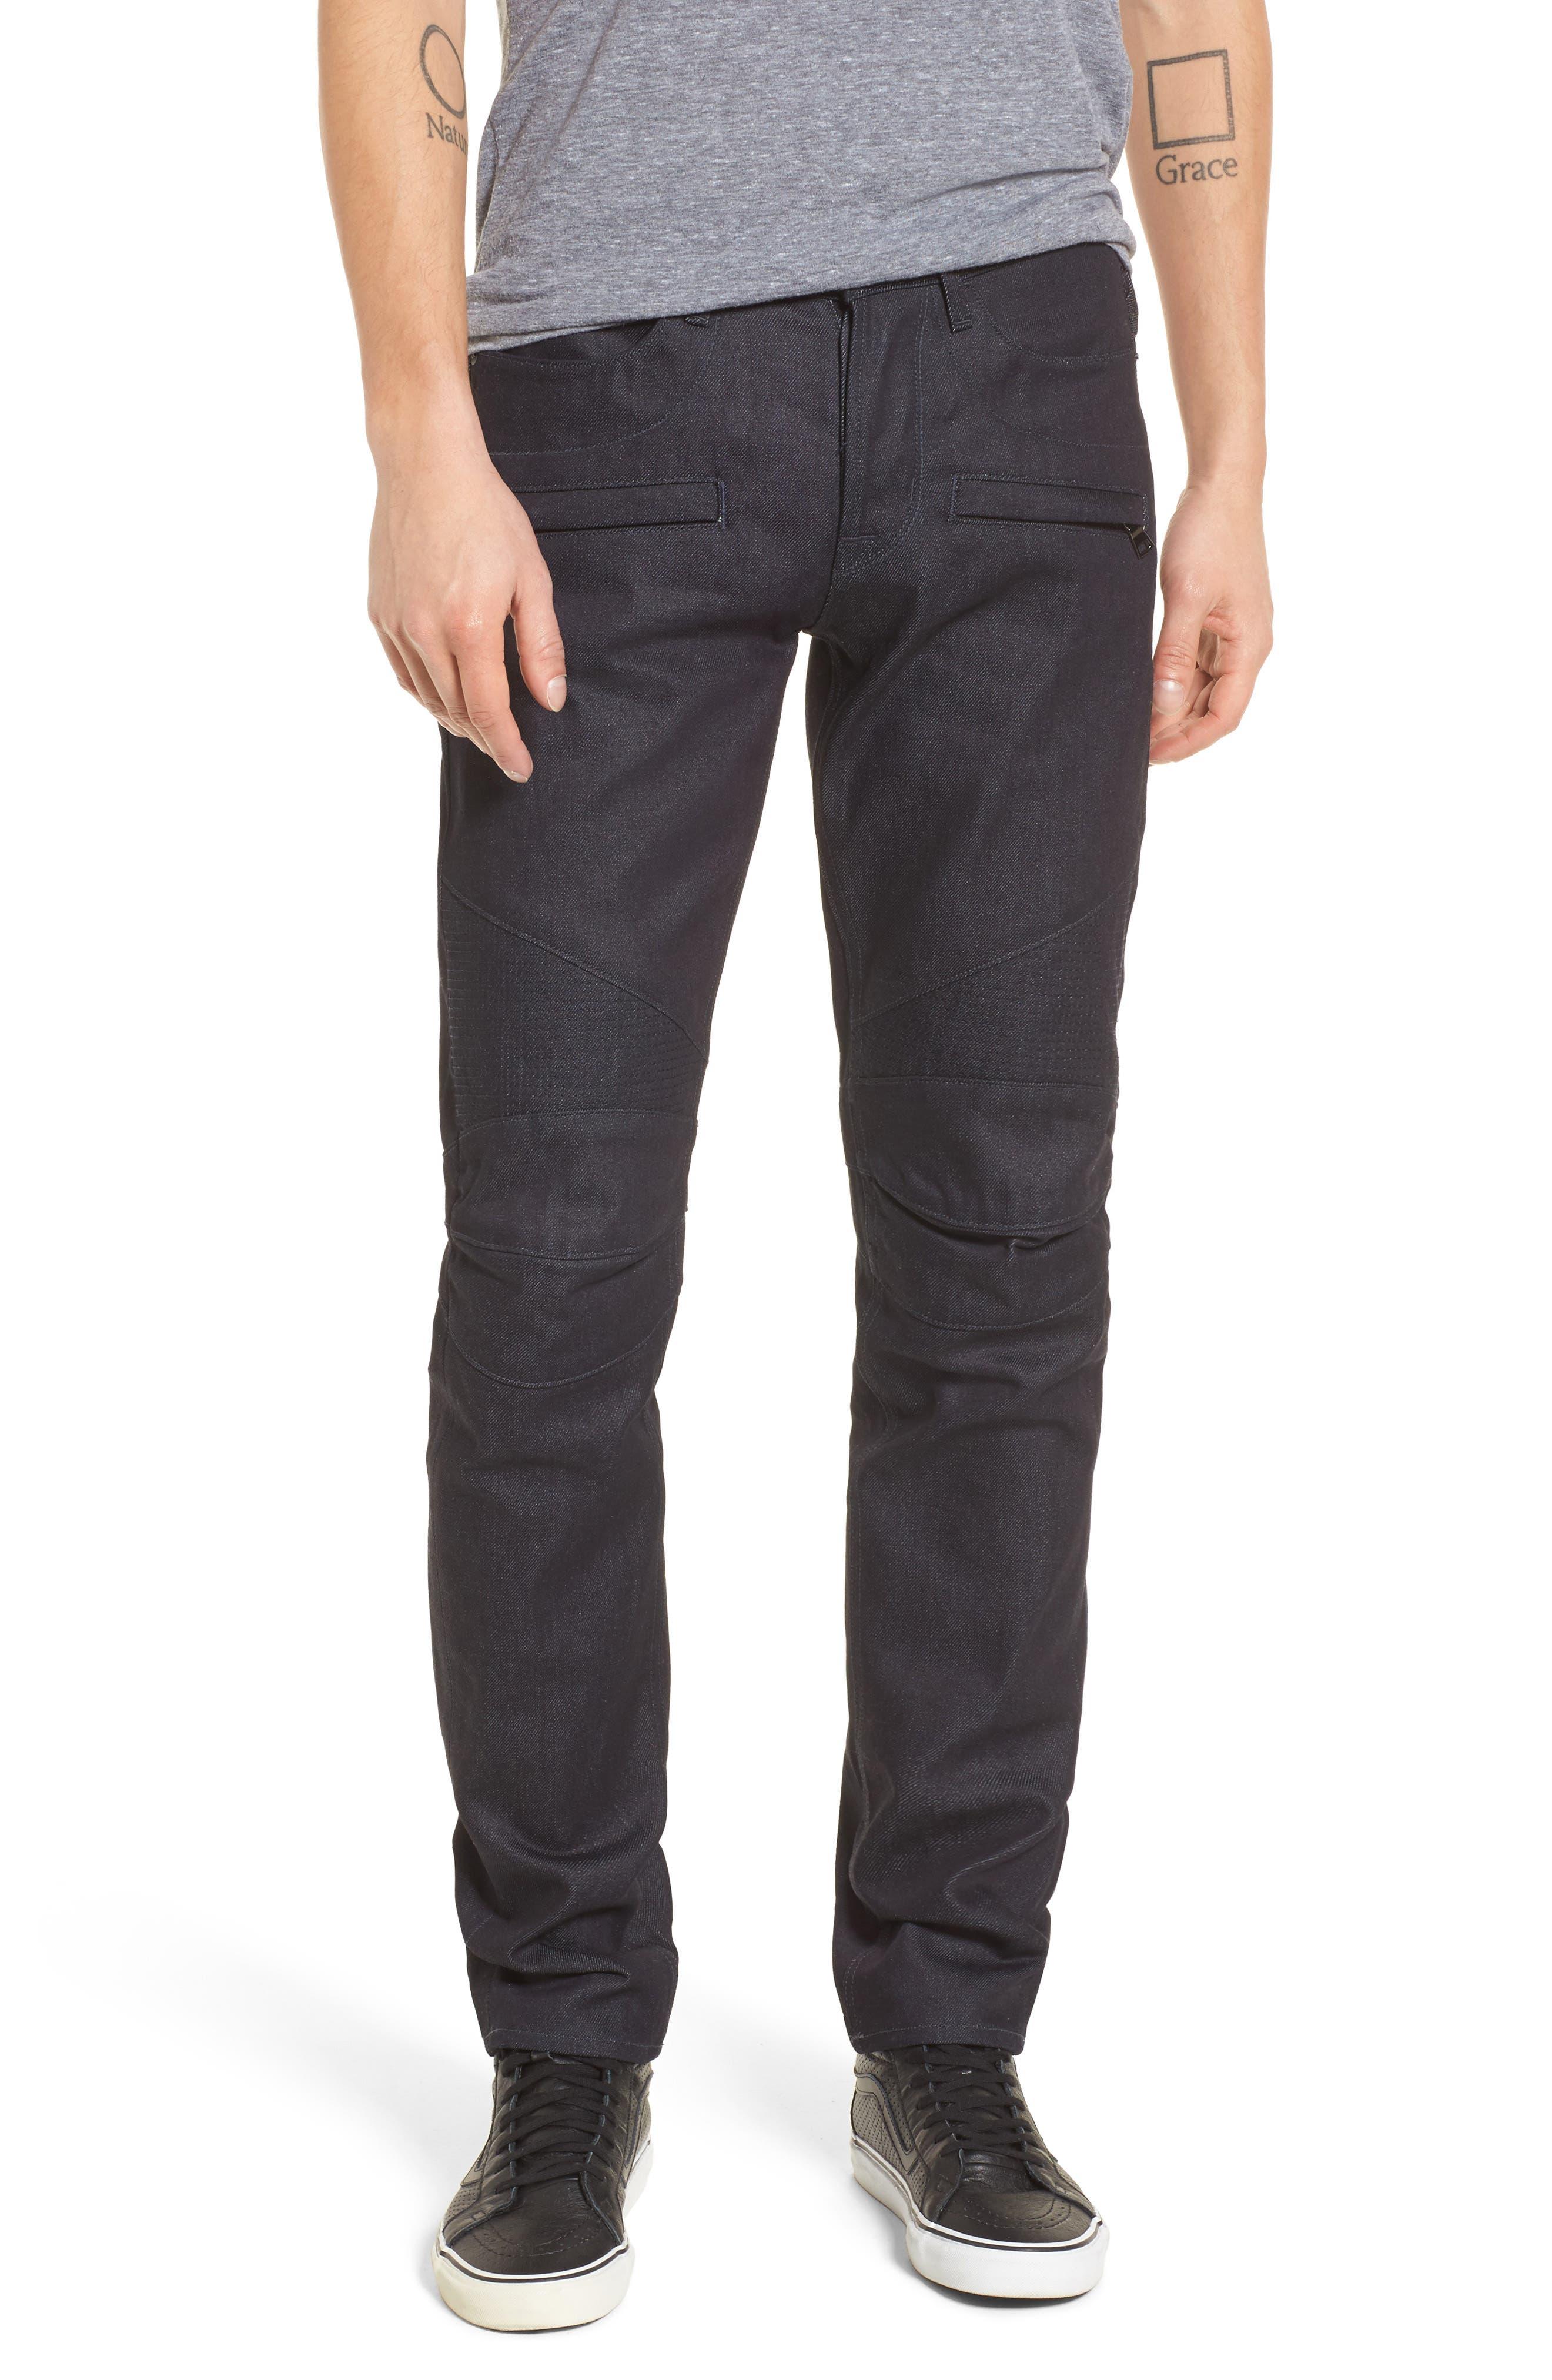 Blinder Biker Skinny Fit Jeans,                         Main,                         color, Raw